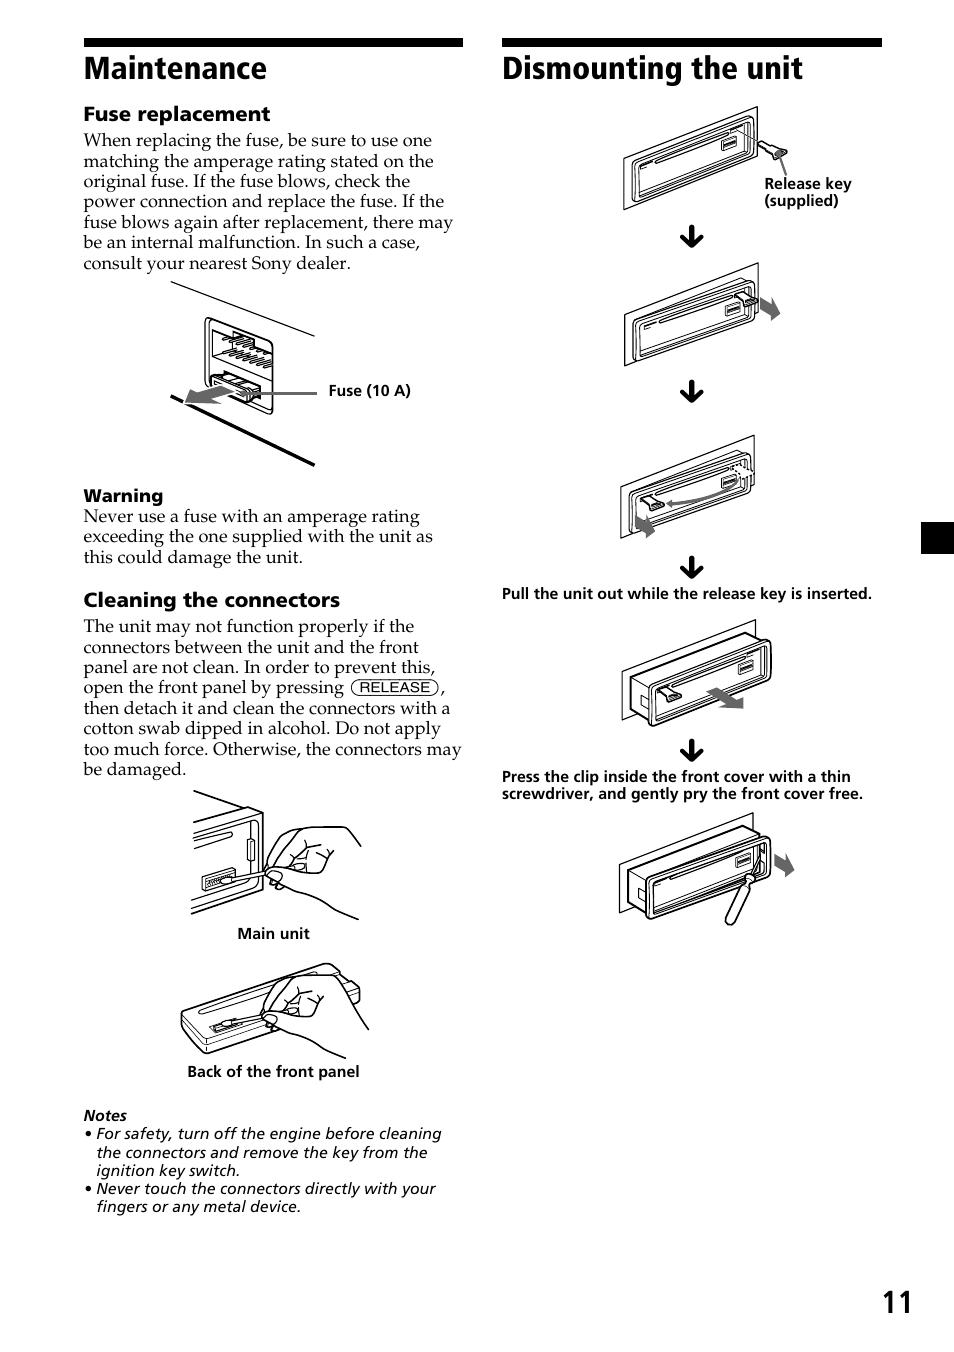 11 dismounting the unit maintenance sony cdx 4250 user manual rh manualsdir com